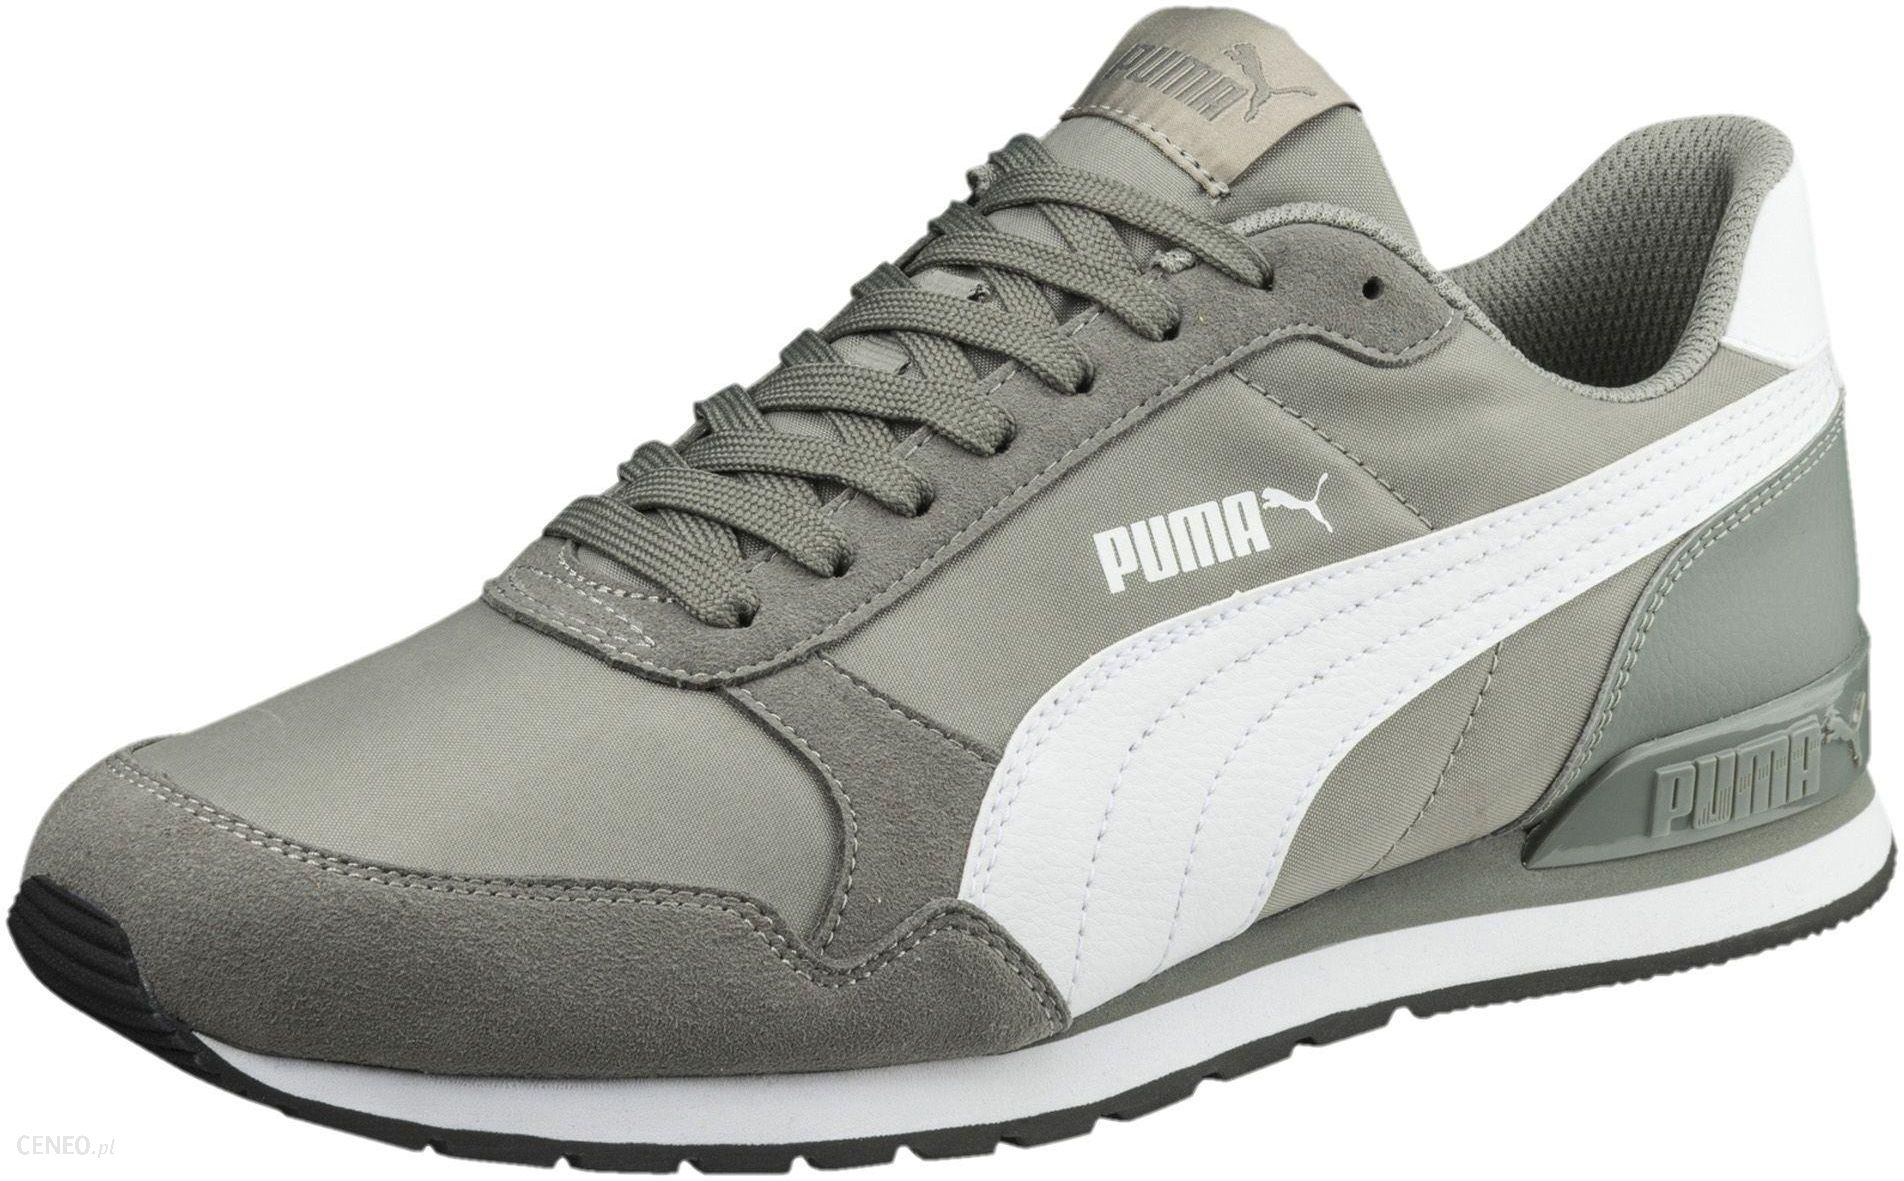 Buty Puma ST Runner NL 35673835 Ceny i opinie Ceneo.pl